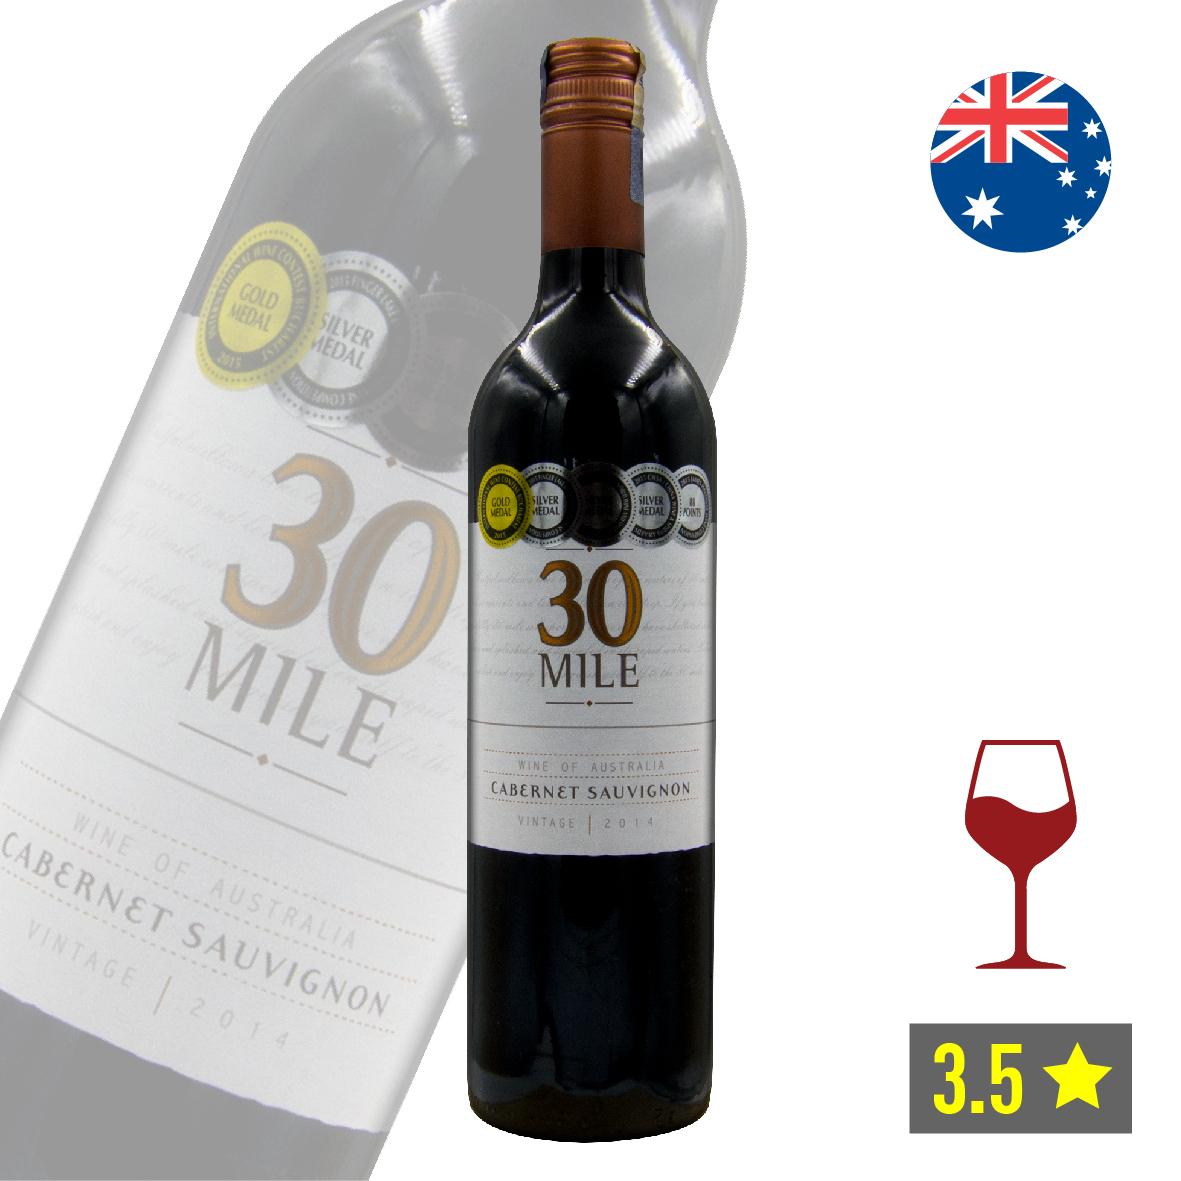 17-30 MILE CABERNET SAUVIGNON 2014-Australia-01.jpg